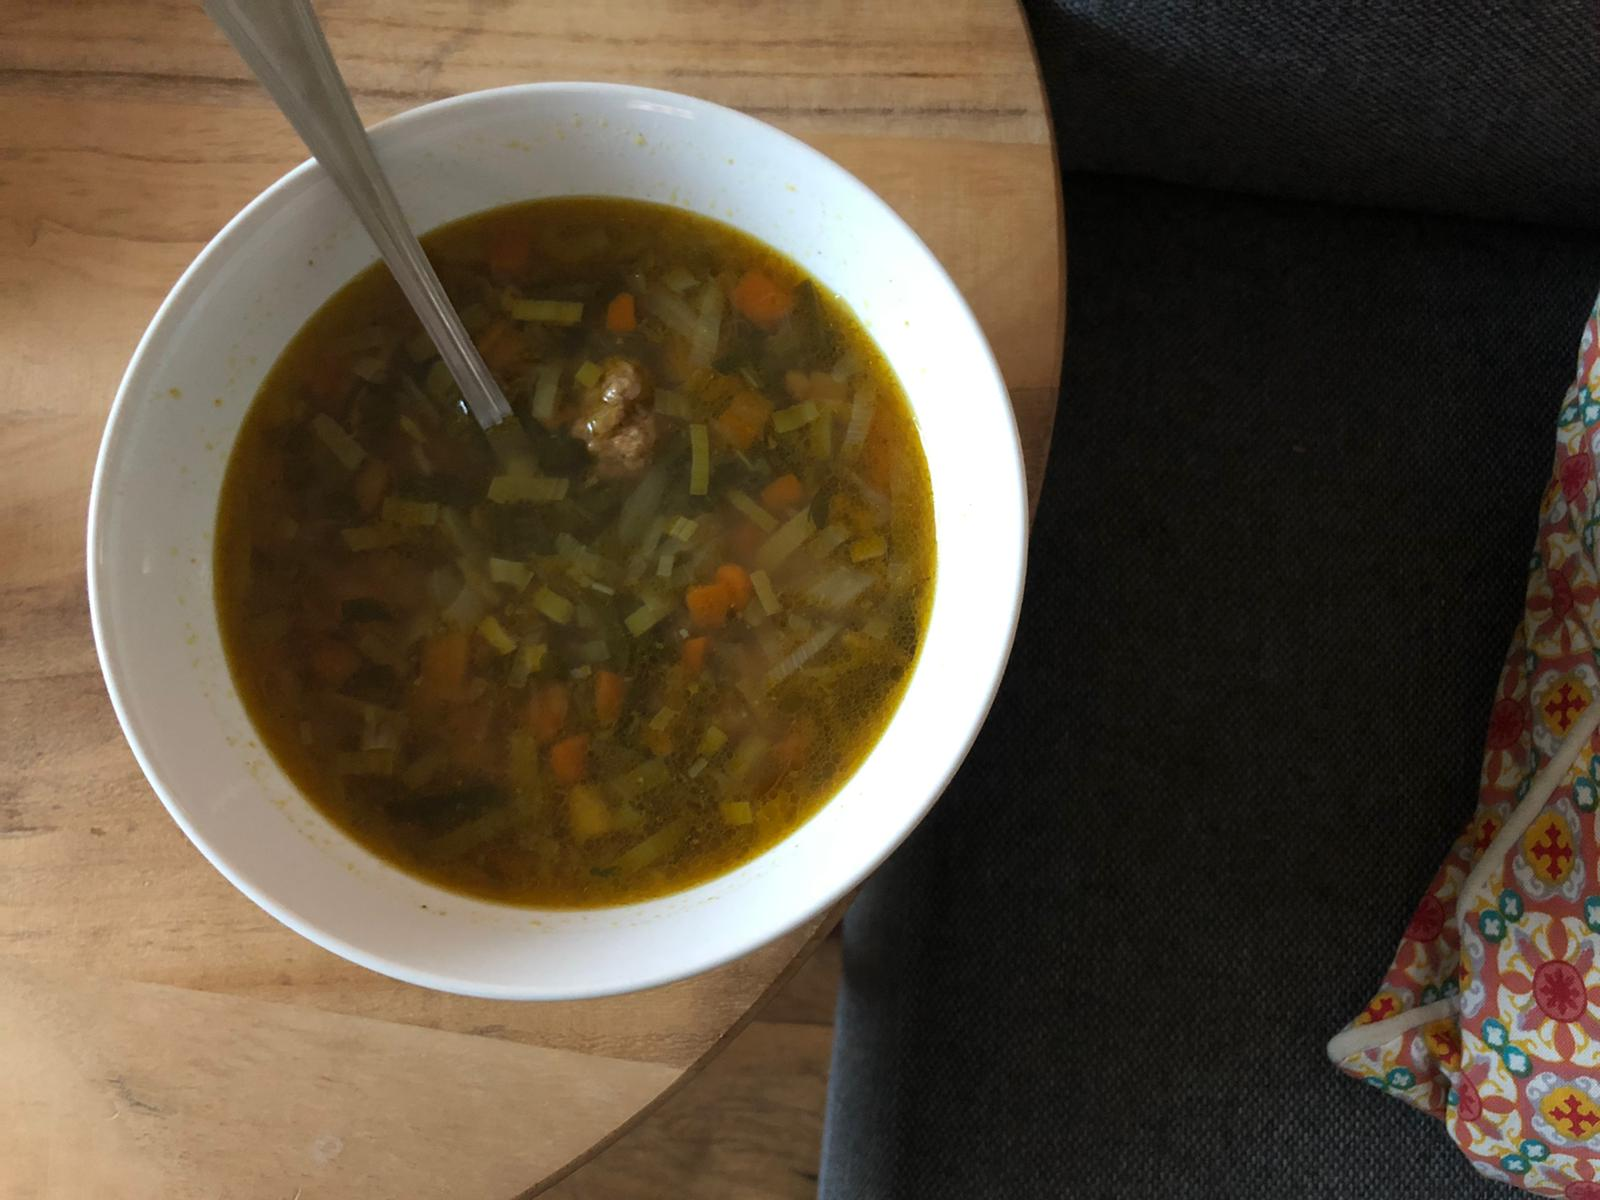 Zelfgemaakte groentensoep